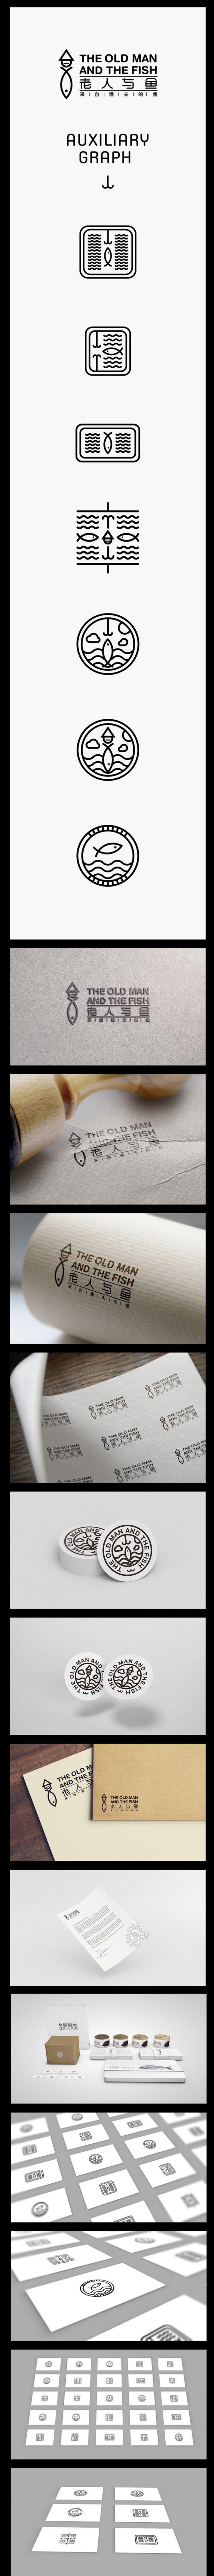 Great work! #logo #identity #branding